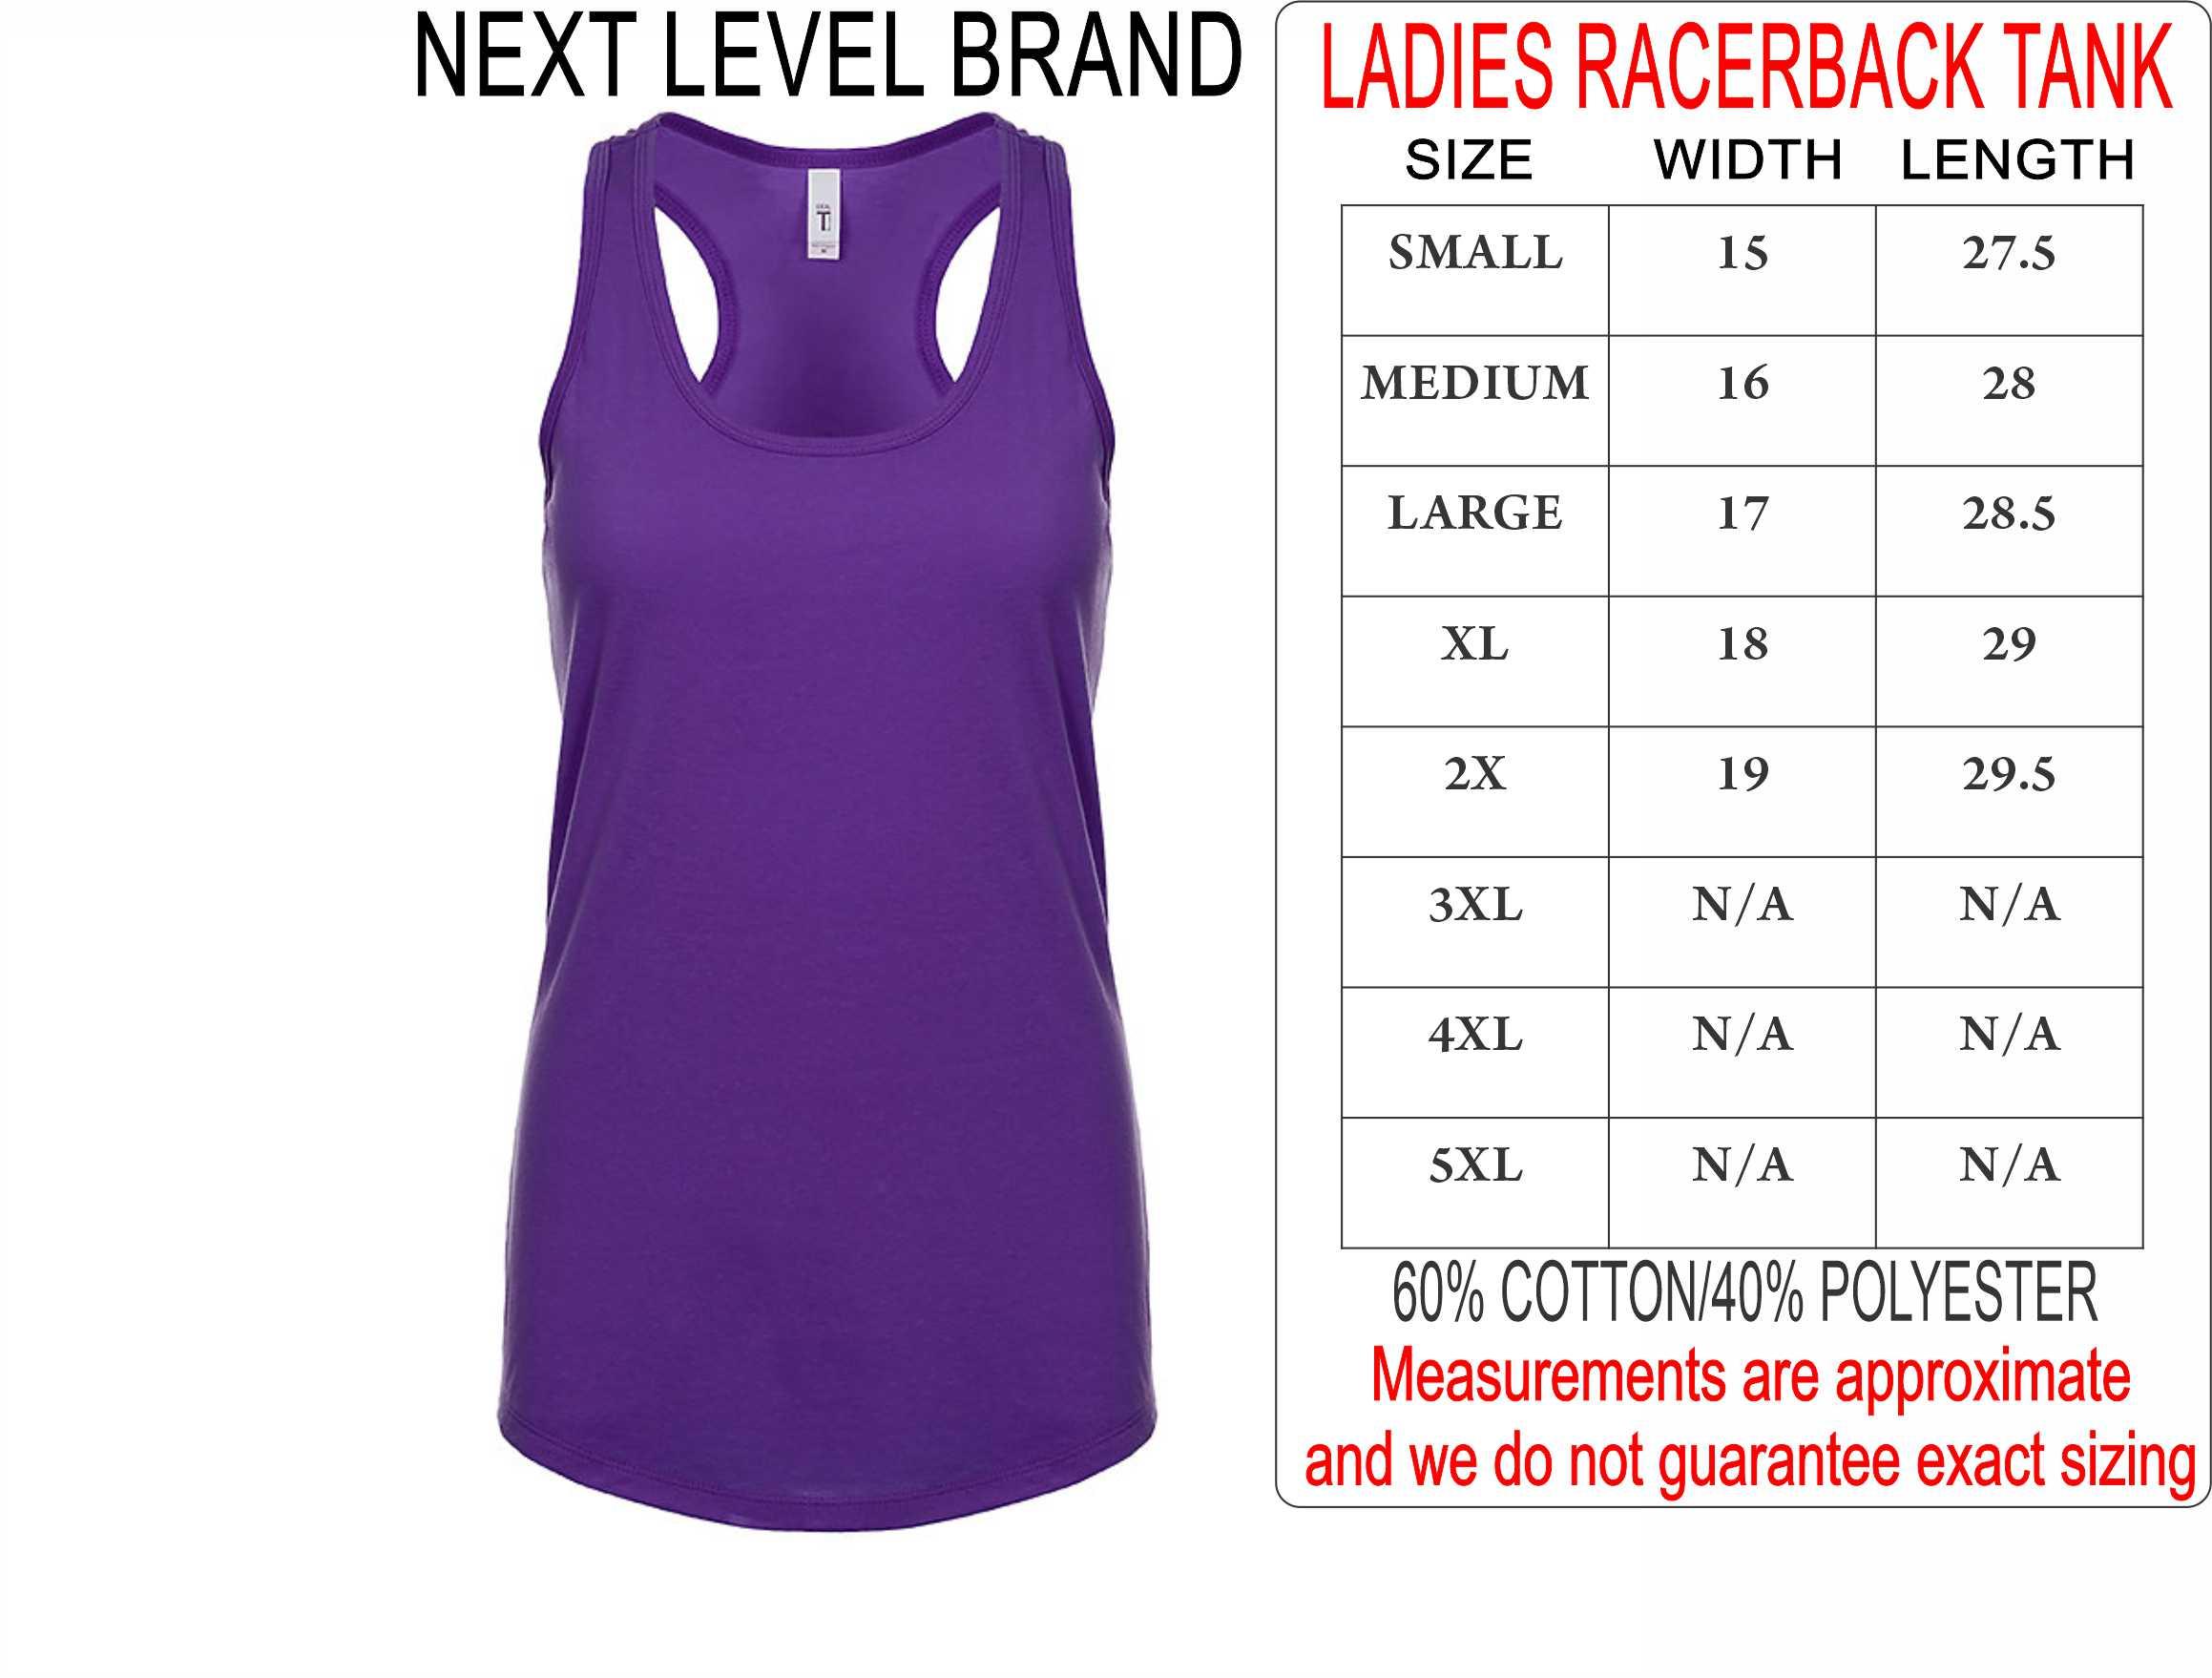 ladies-racerback-size-chart.jpg